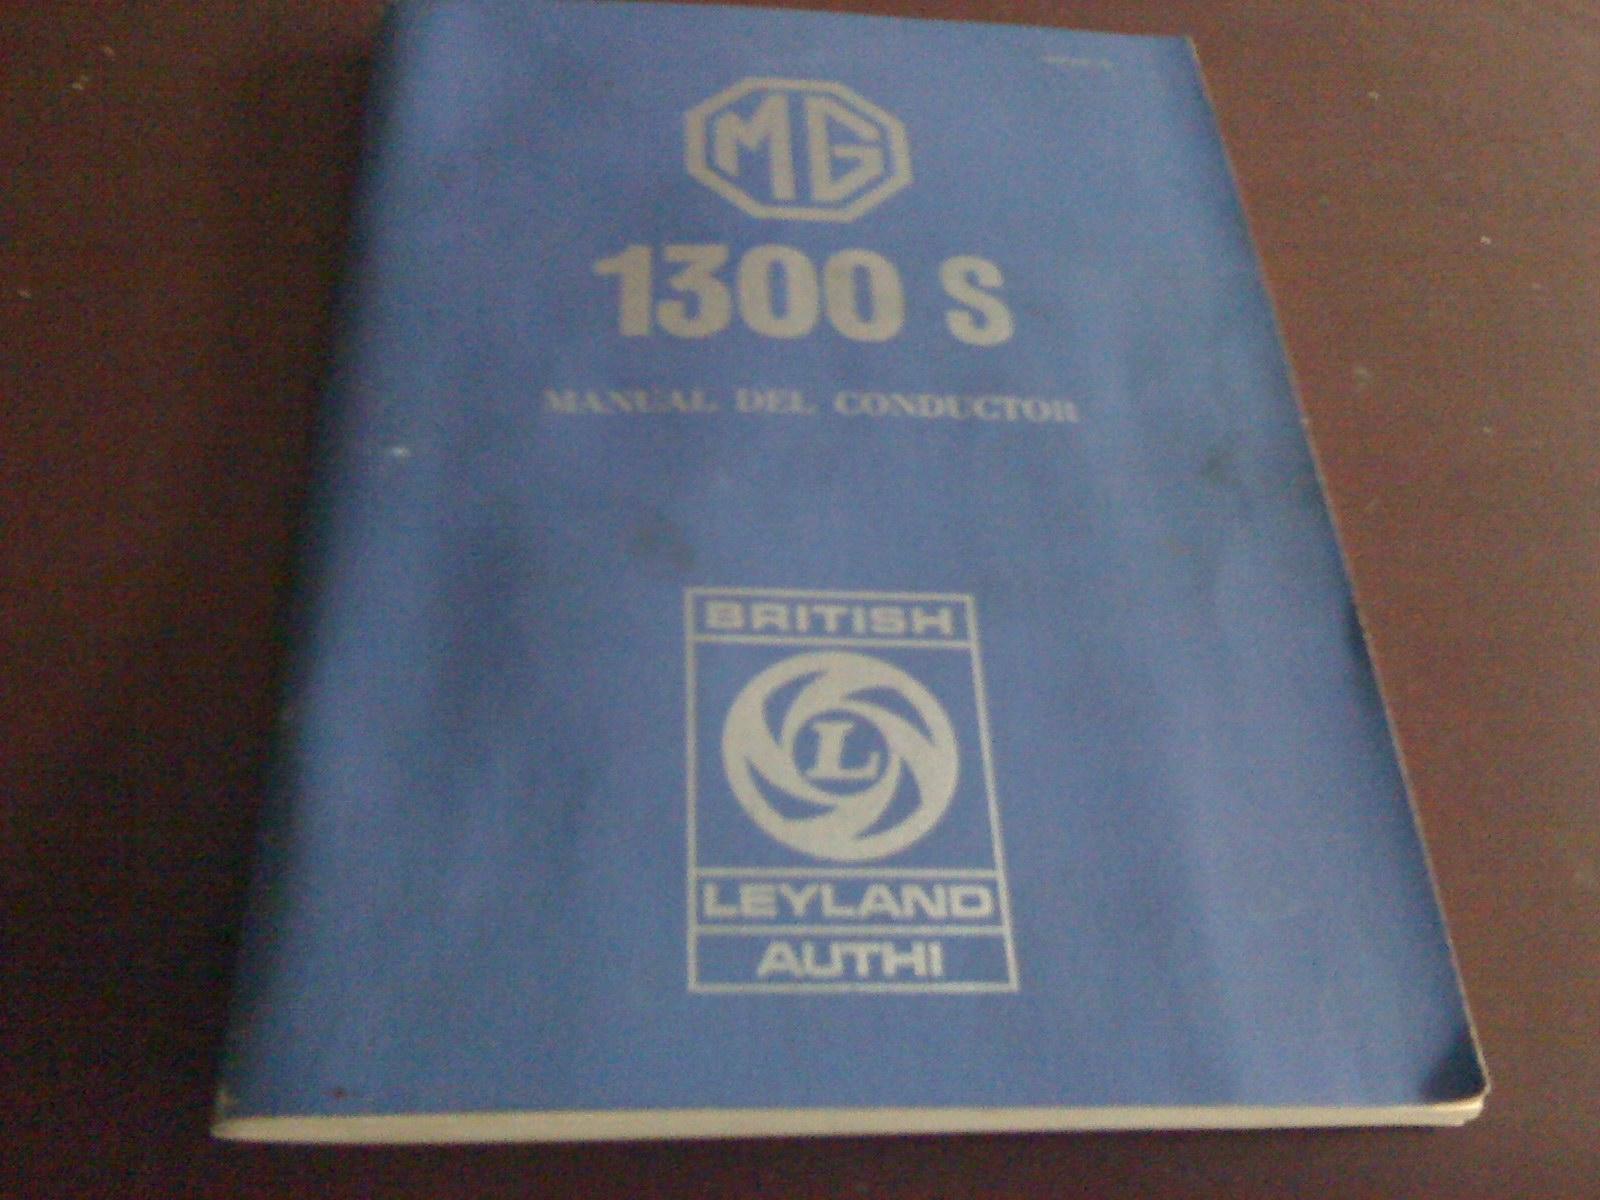 Forum MG - - MG 1300 S